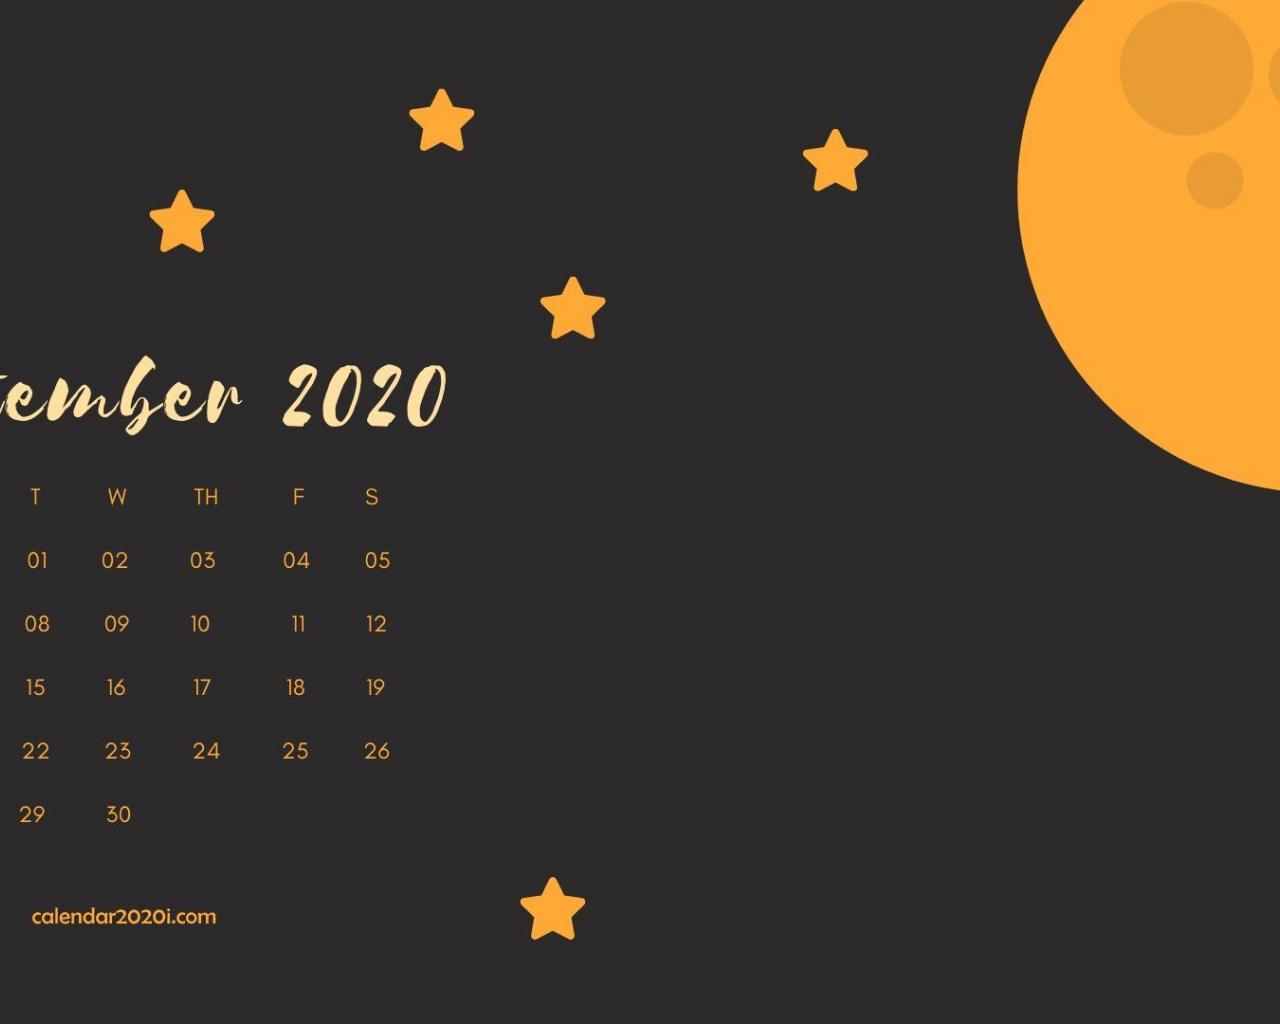 Free Download September 2020 Calendar Desktop Wallpaper In 2019 Calendar 1920x1080 For Your Desktop Mobile Tablet Explore 42 September 2020 Calendar Wallpapers September 2020 Calendar Wallpapers September 2019 Calendar Wallpapers Calendar